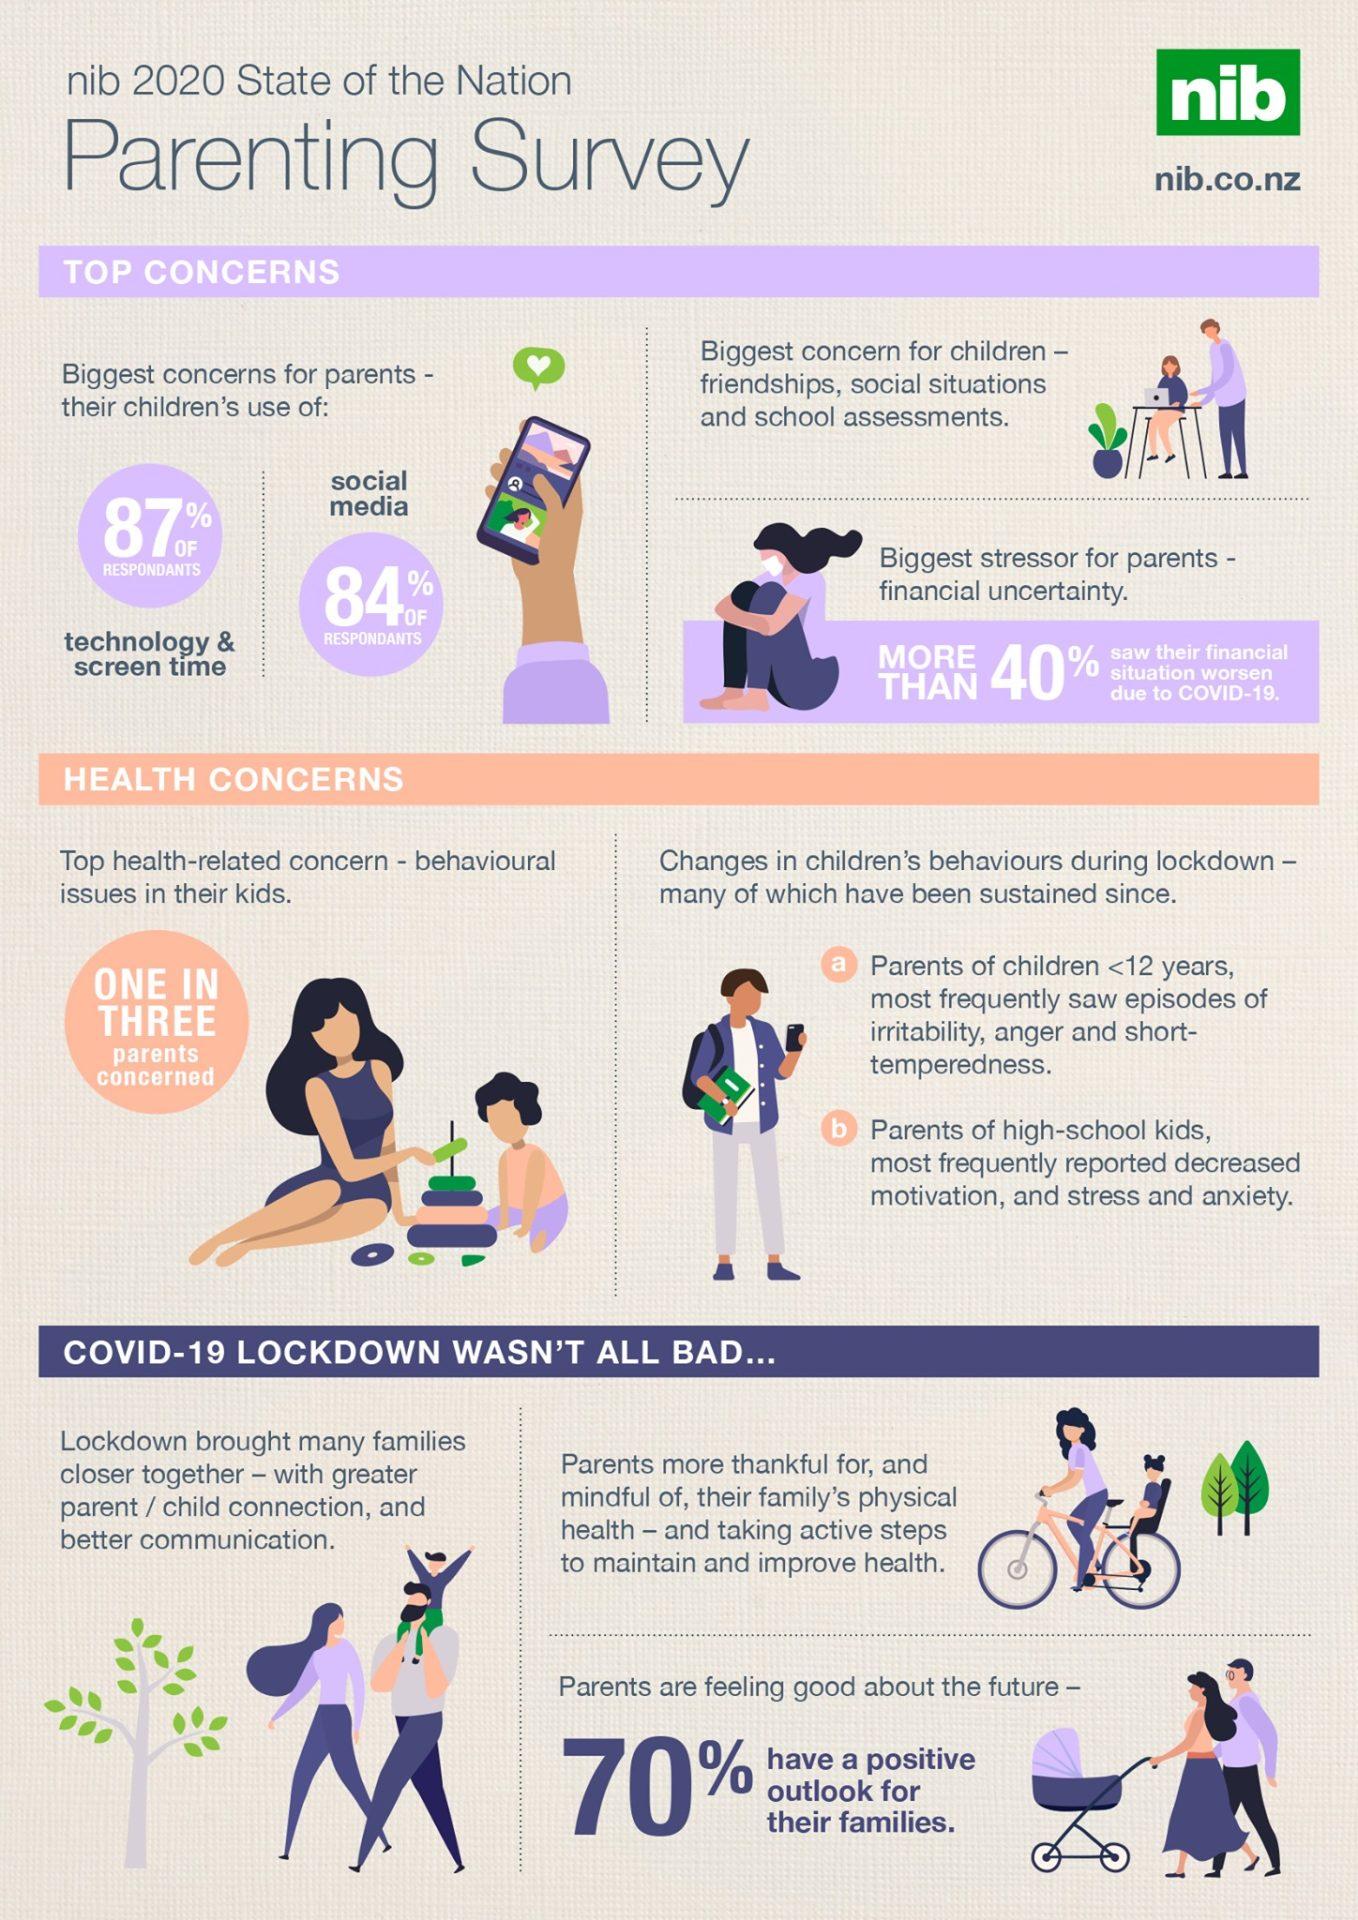 nib 2020 Parenting Survey infographic